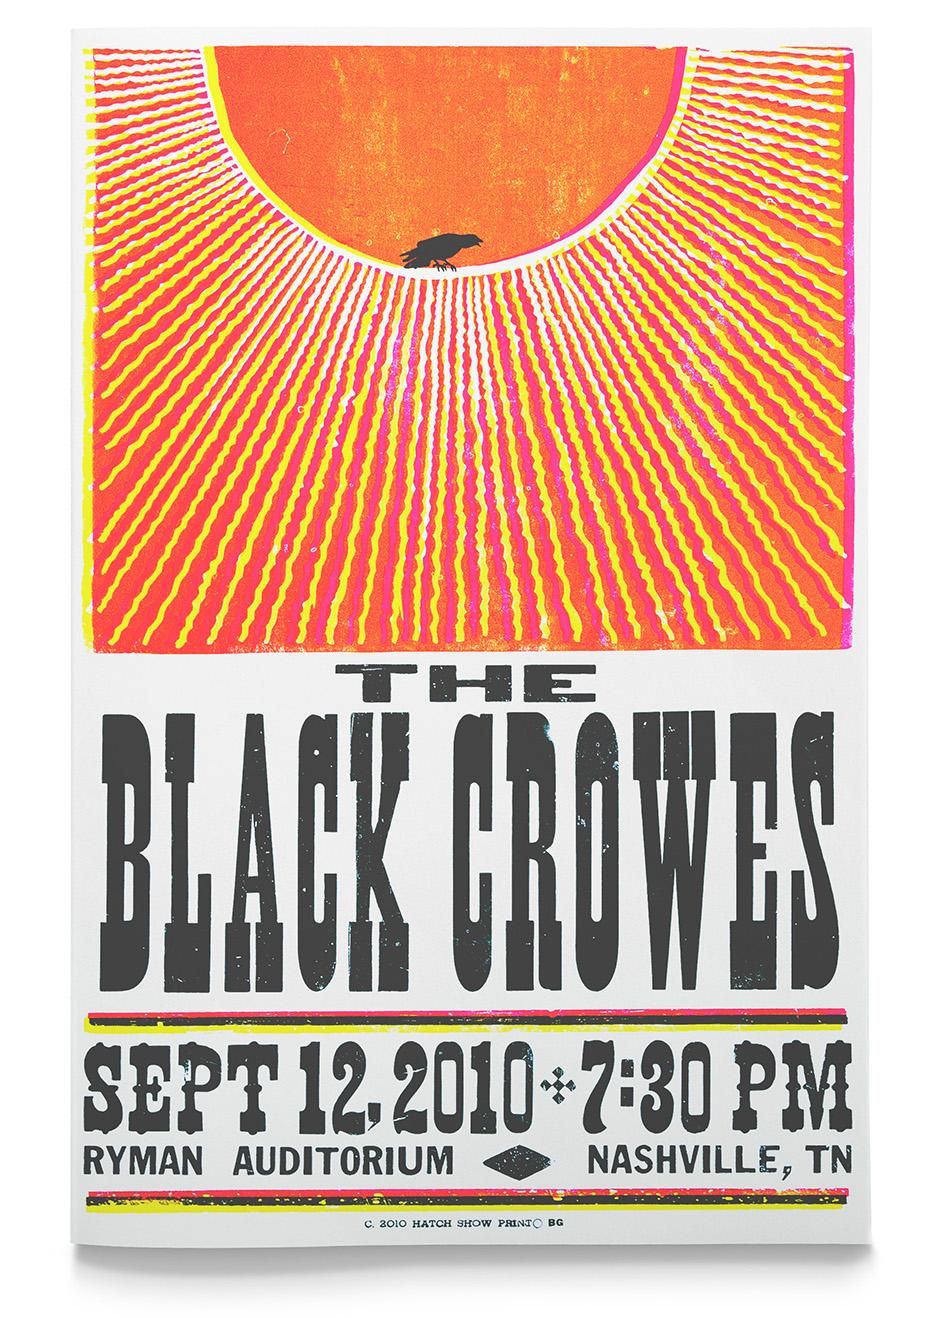 Black_Crowes_concert_poster_Hatch_Show_Print_Nashville_Tennessee_Ryman_Auditorium.jpg